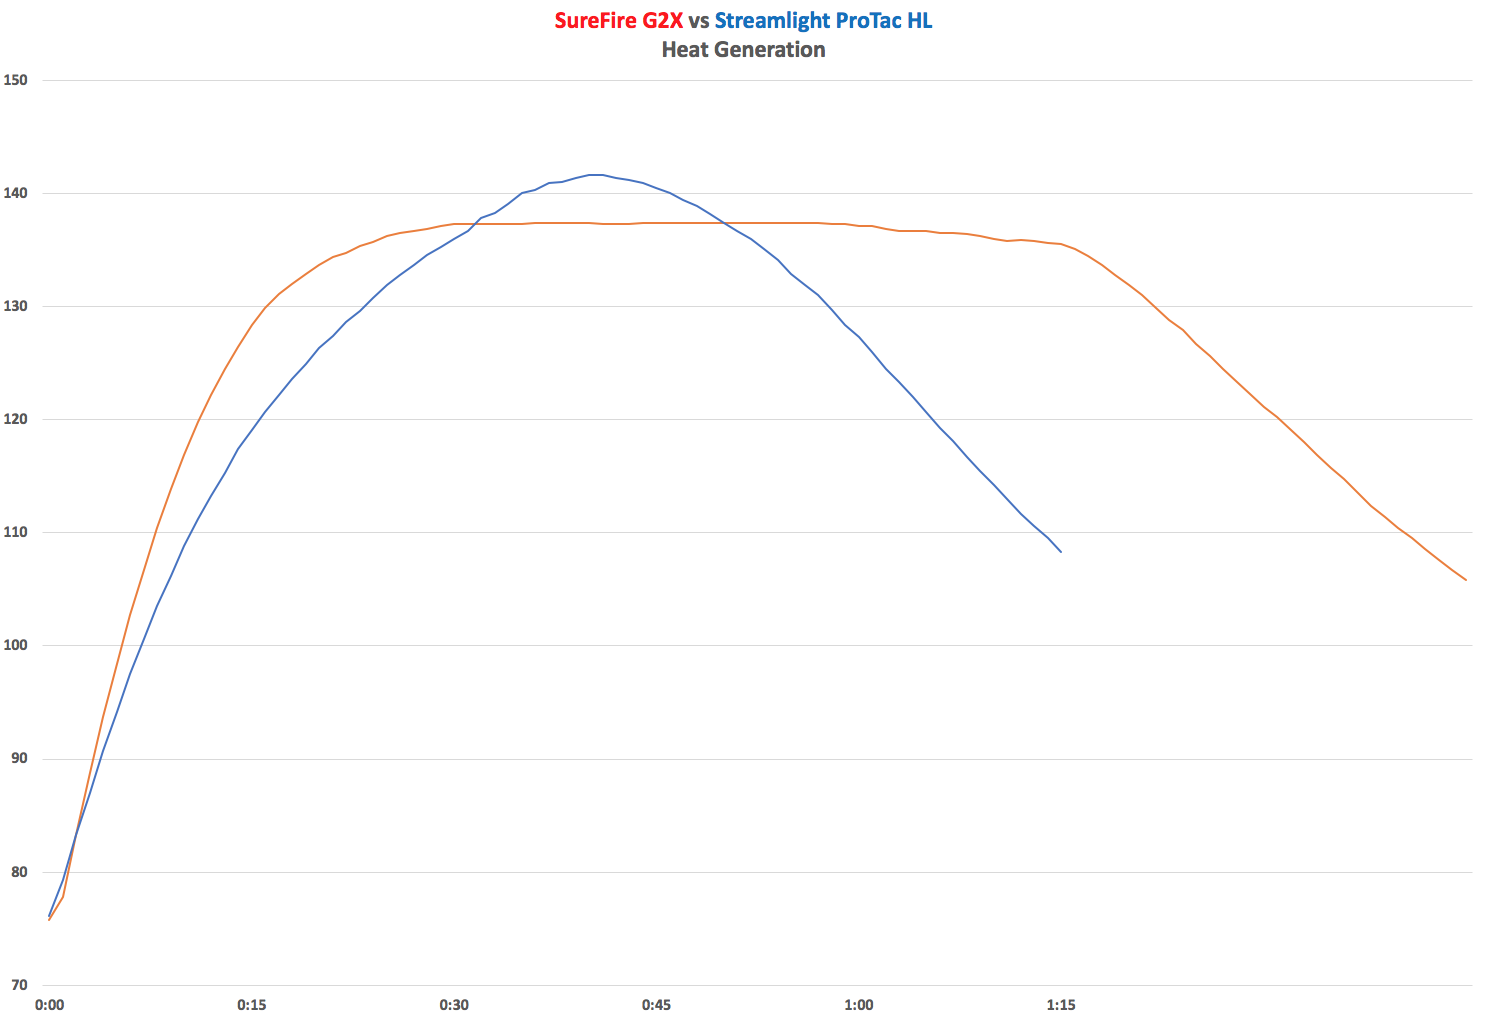 SureFire G2X vs Streamlight ProTac HL Heat Generation